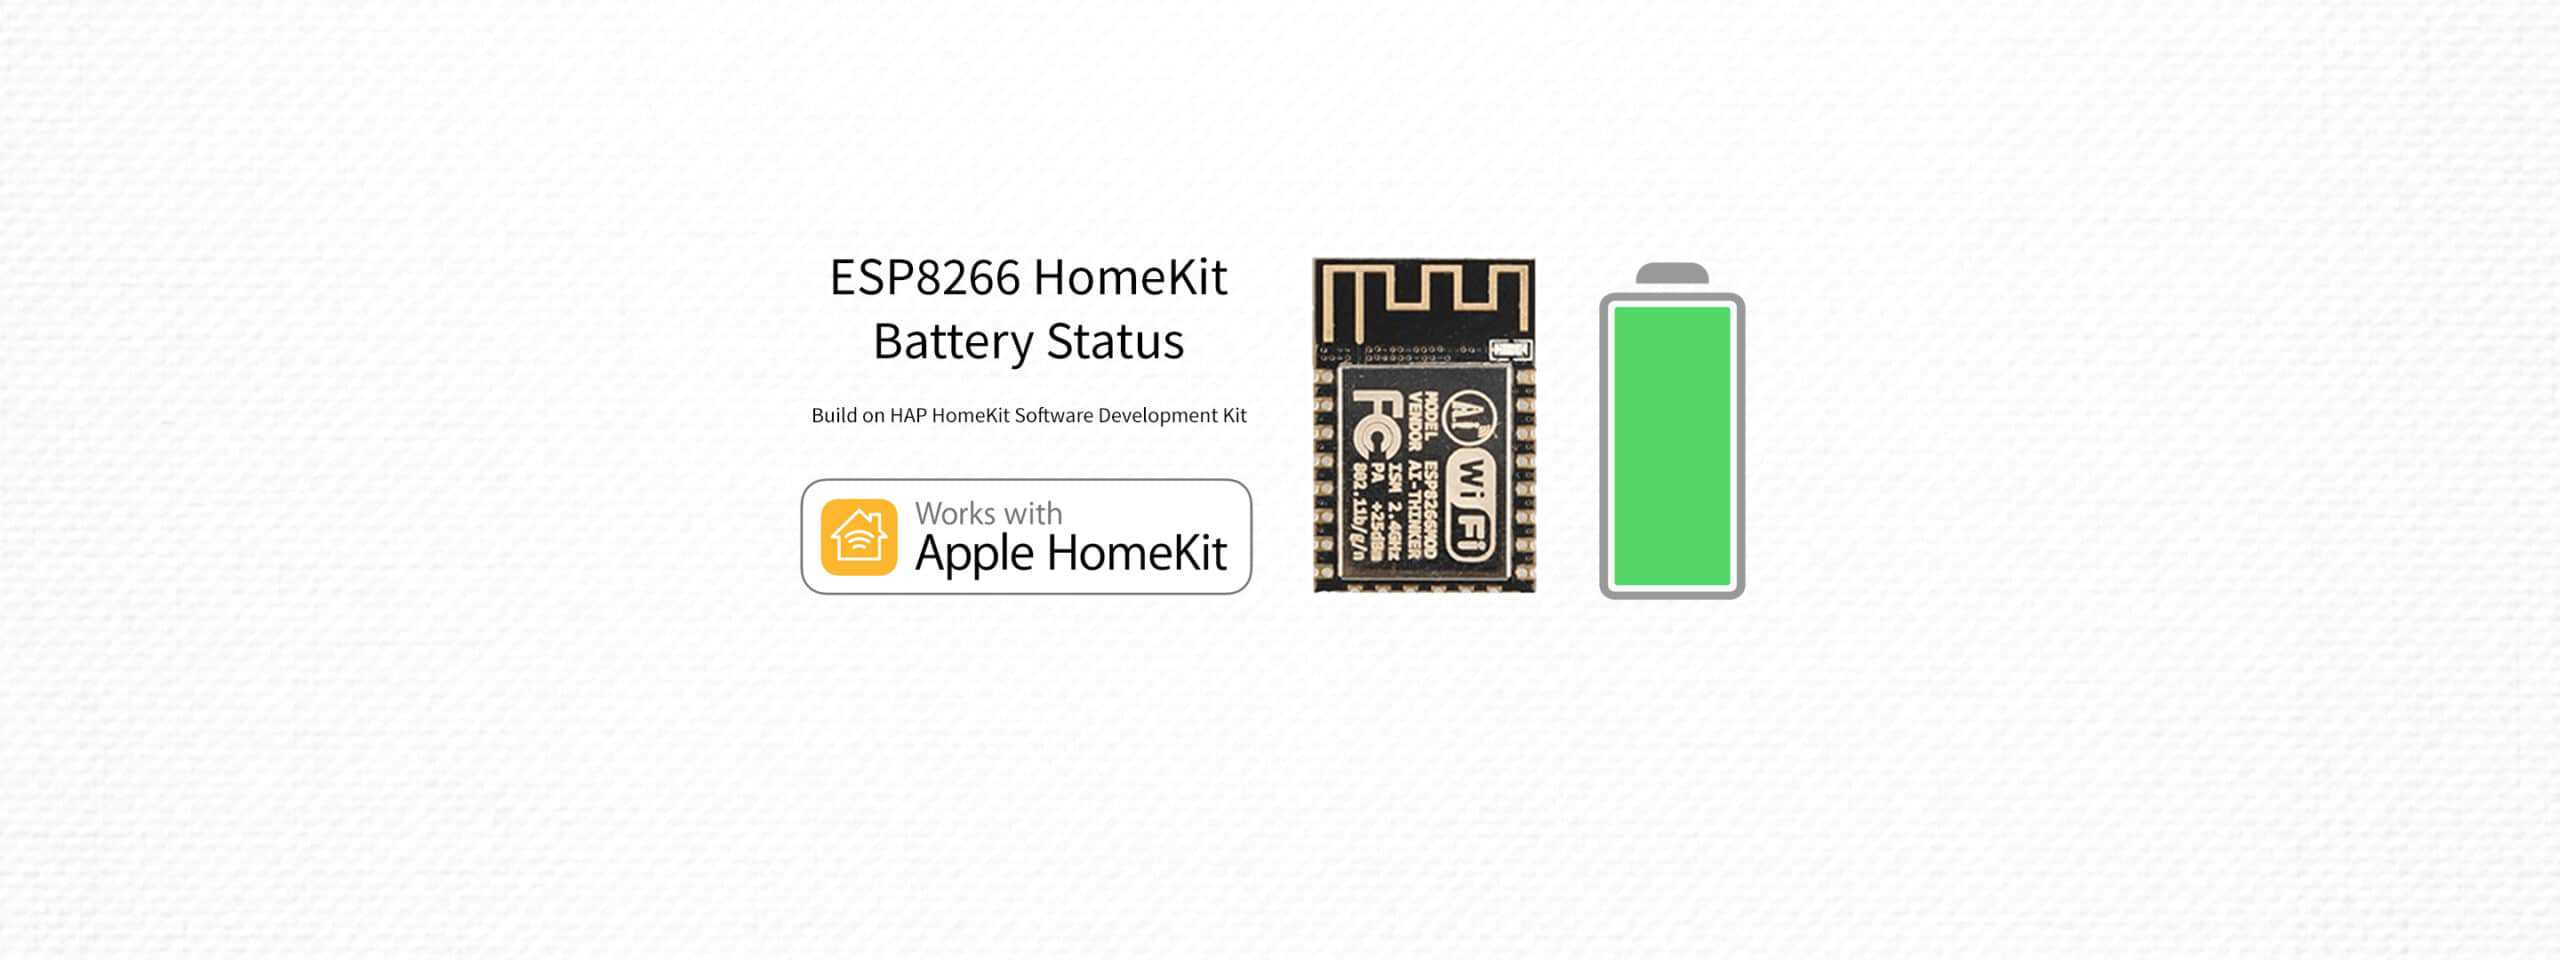 ESP8266 HomeKit – Battery Status